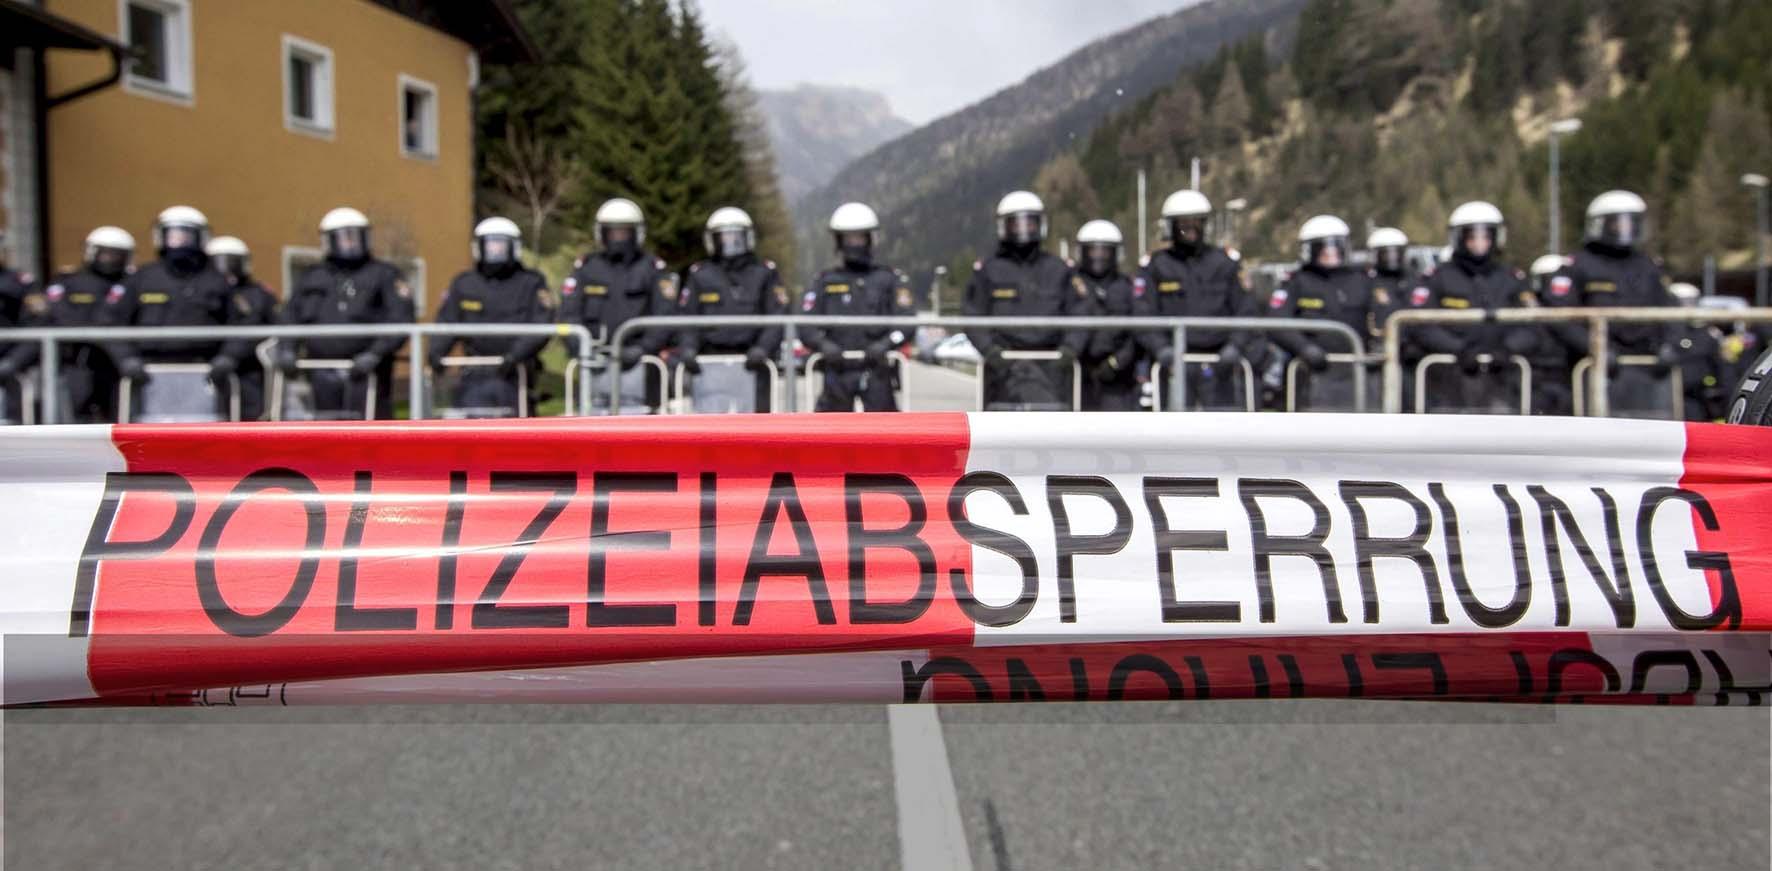 tirolo austriaco frontiera brennero barriera polizia austriaca